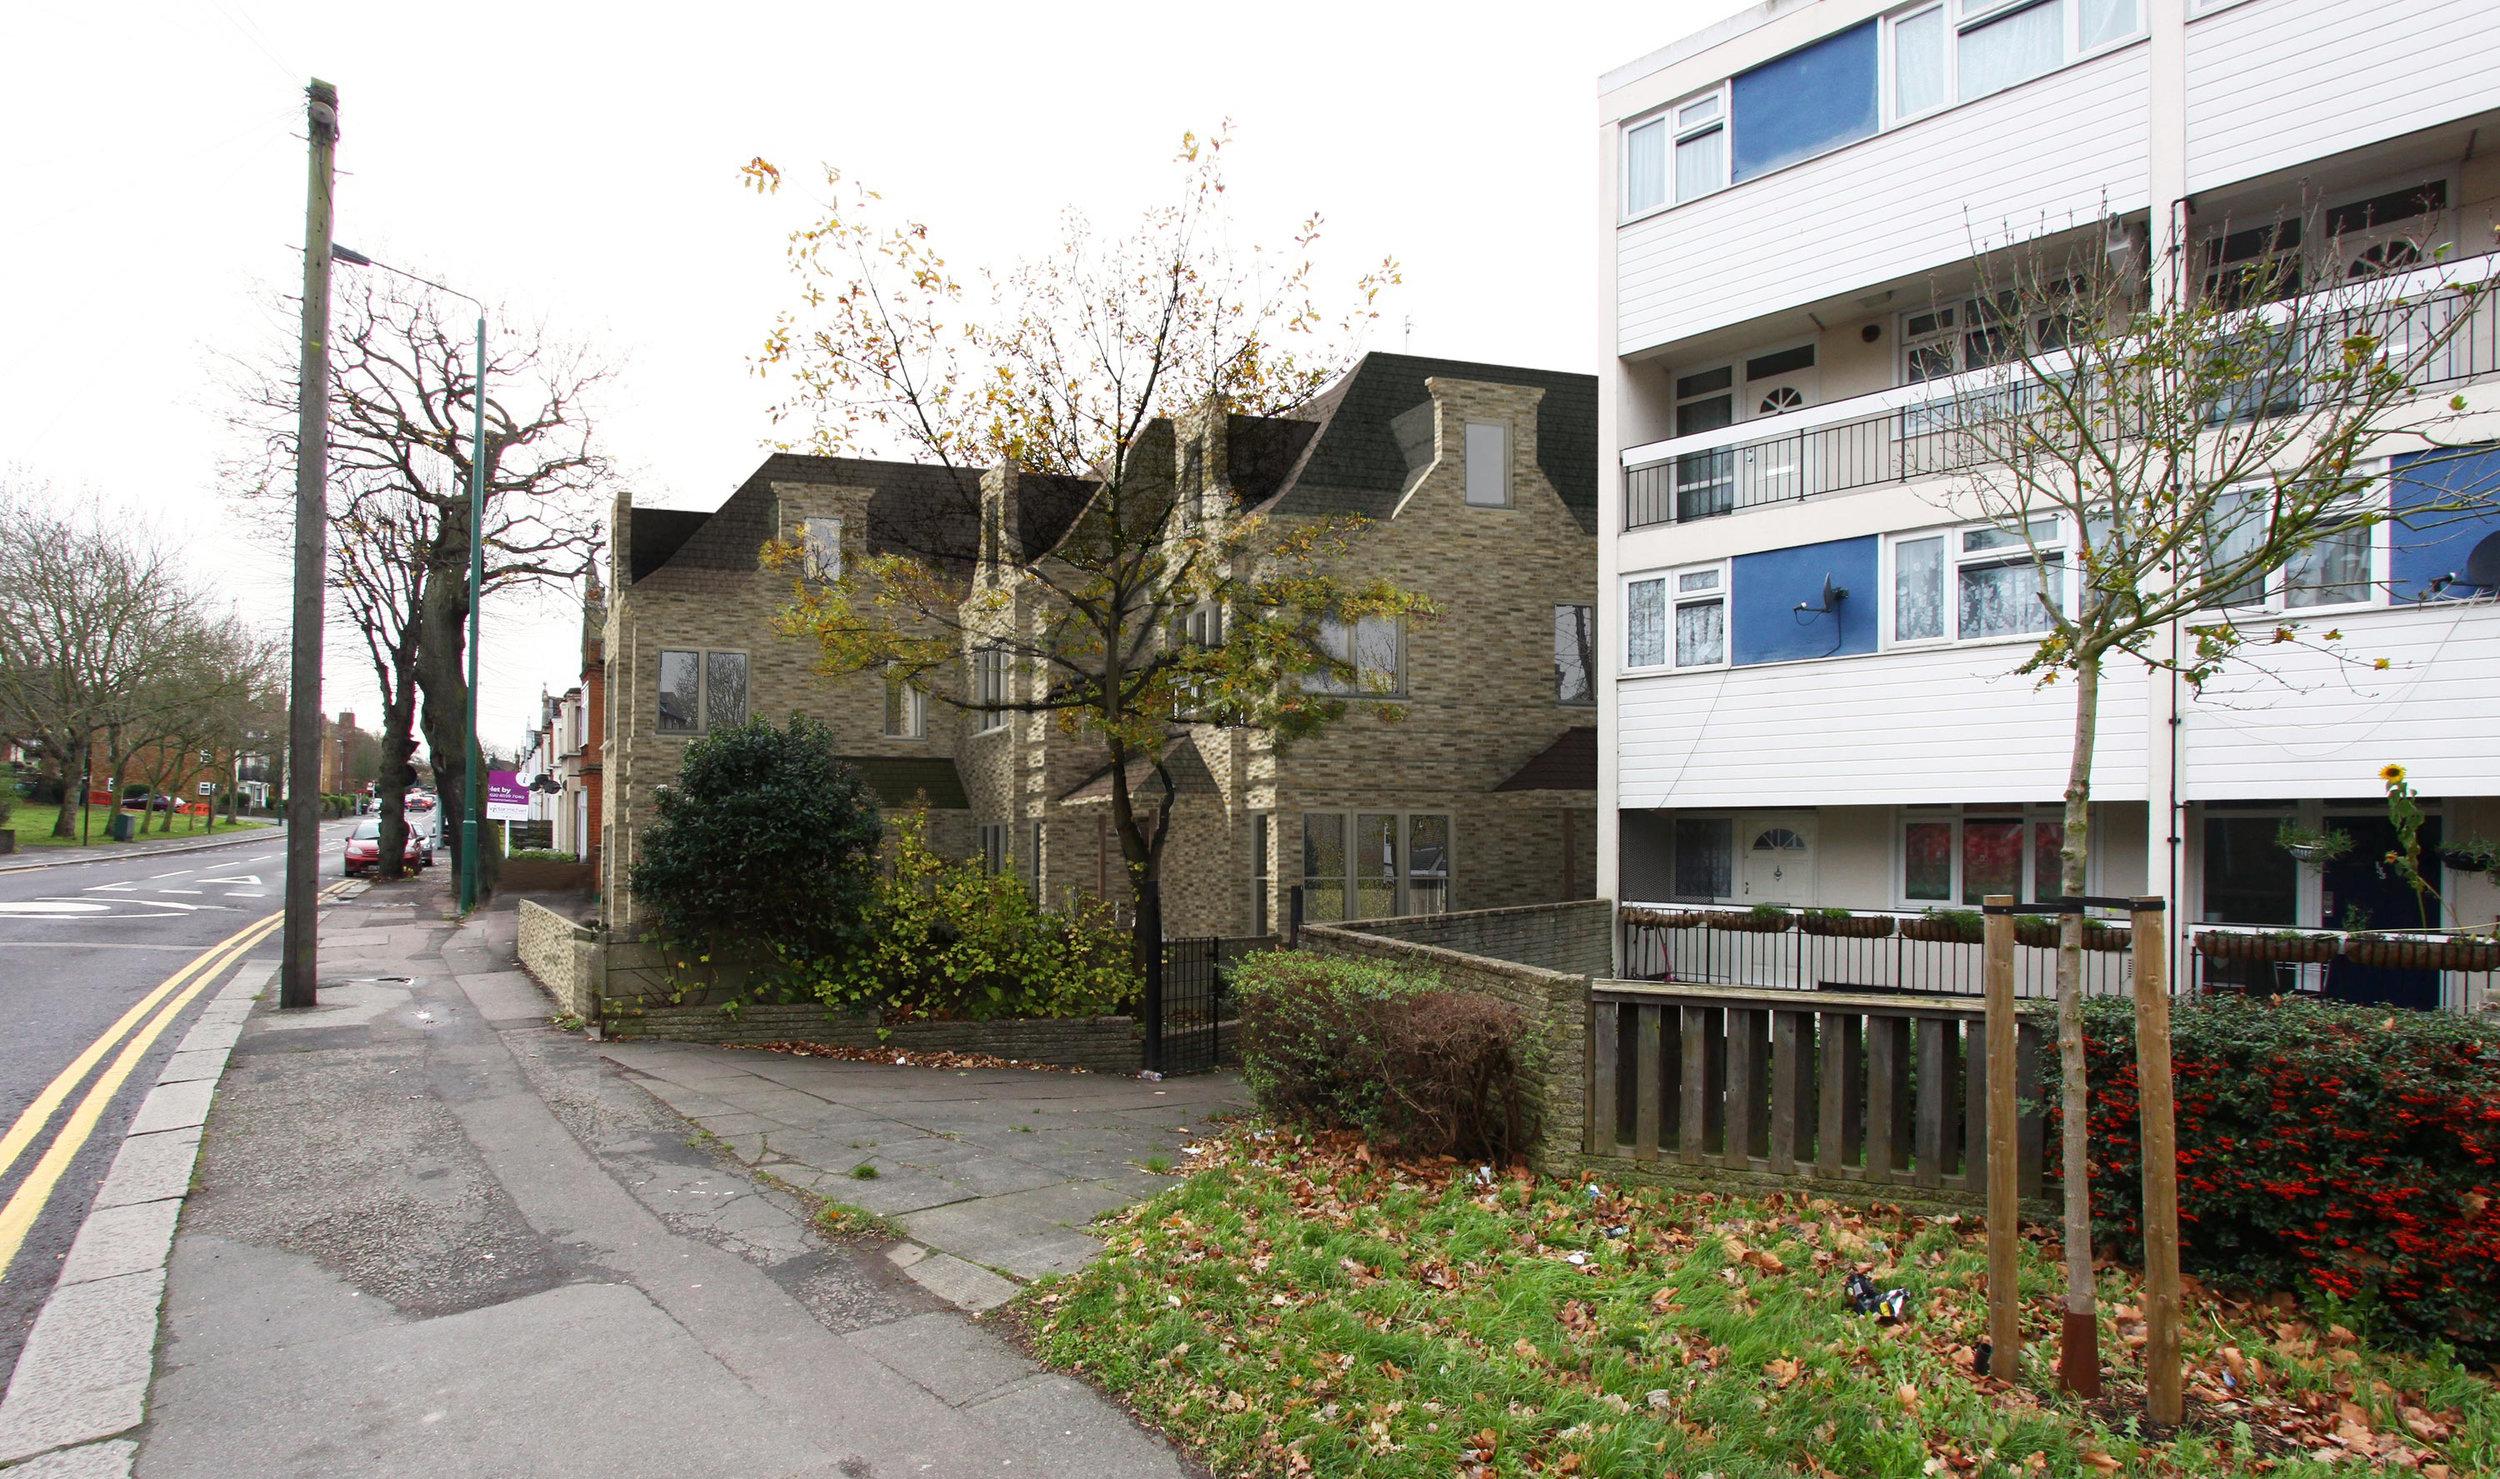 CFL-Chigford-Lane-Street-Side-Craeft-Architects.jpg